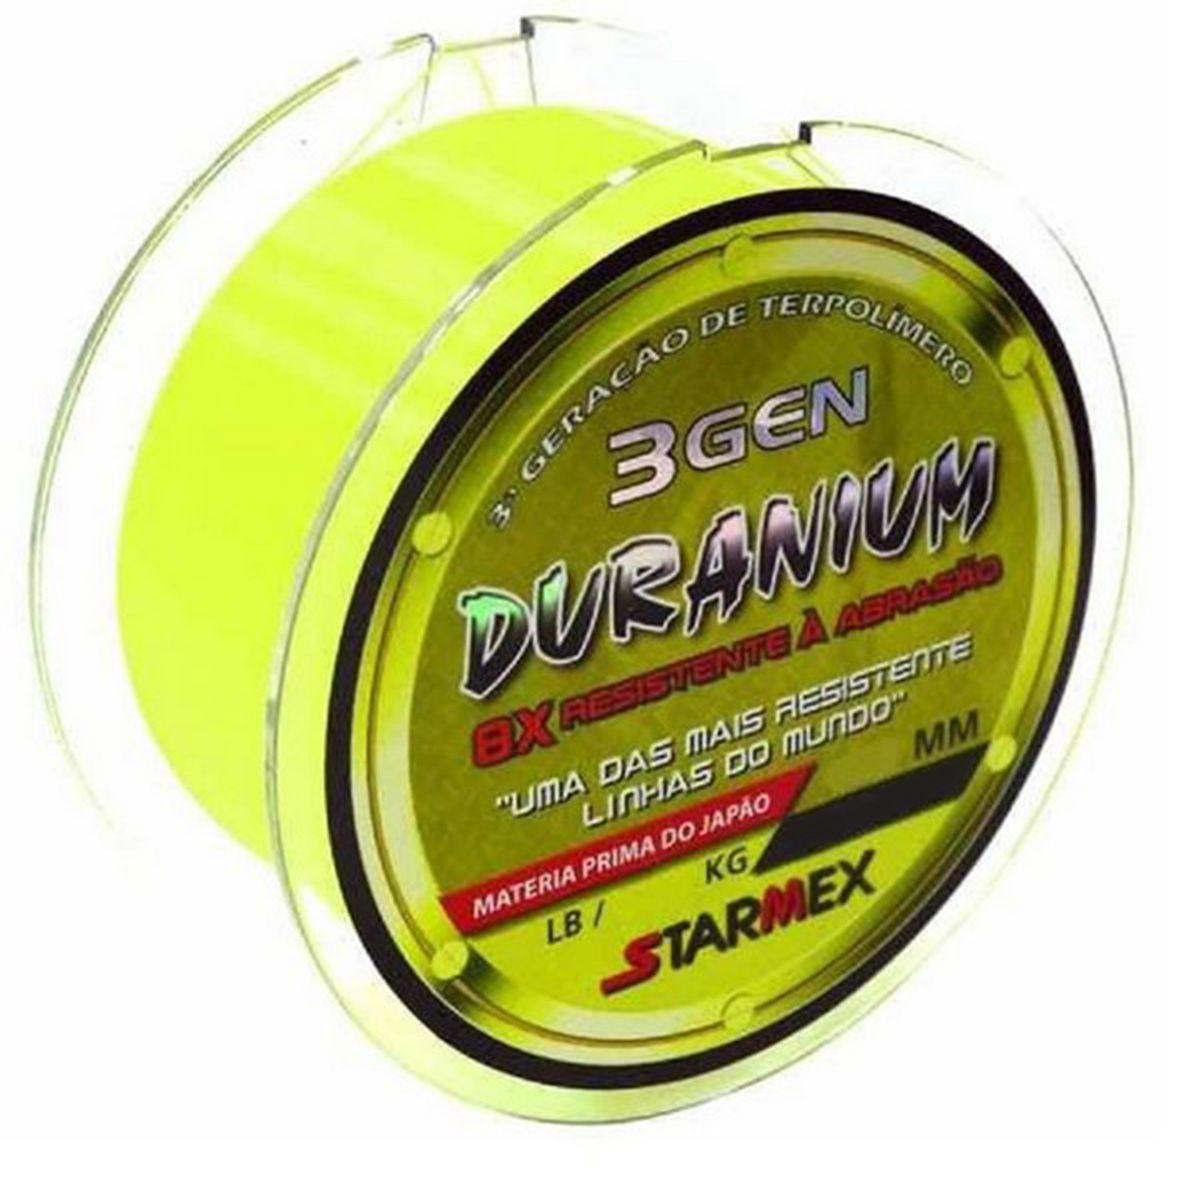 Linha Monofilamento Starmex Duranium/DuraNew 8x 3 GEN 0,28mm 17Lbs 100m - Yellow